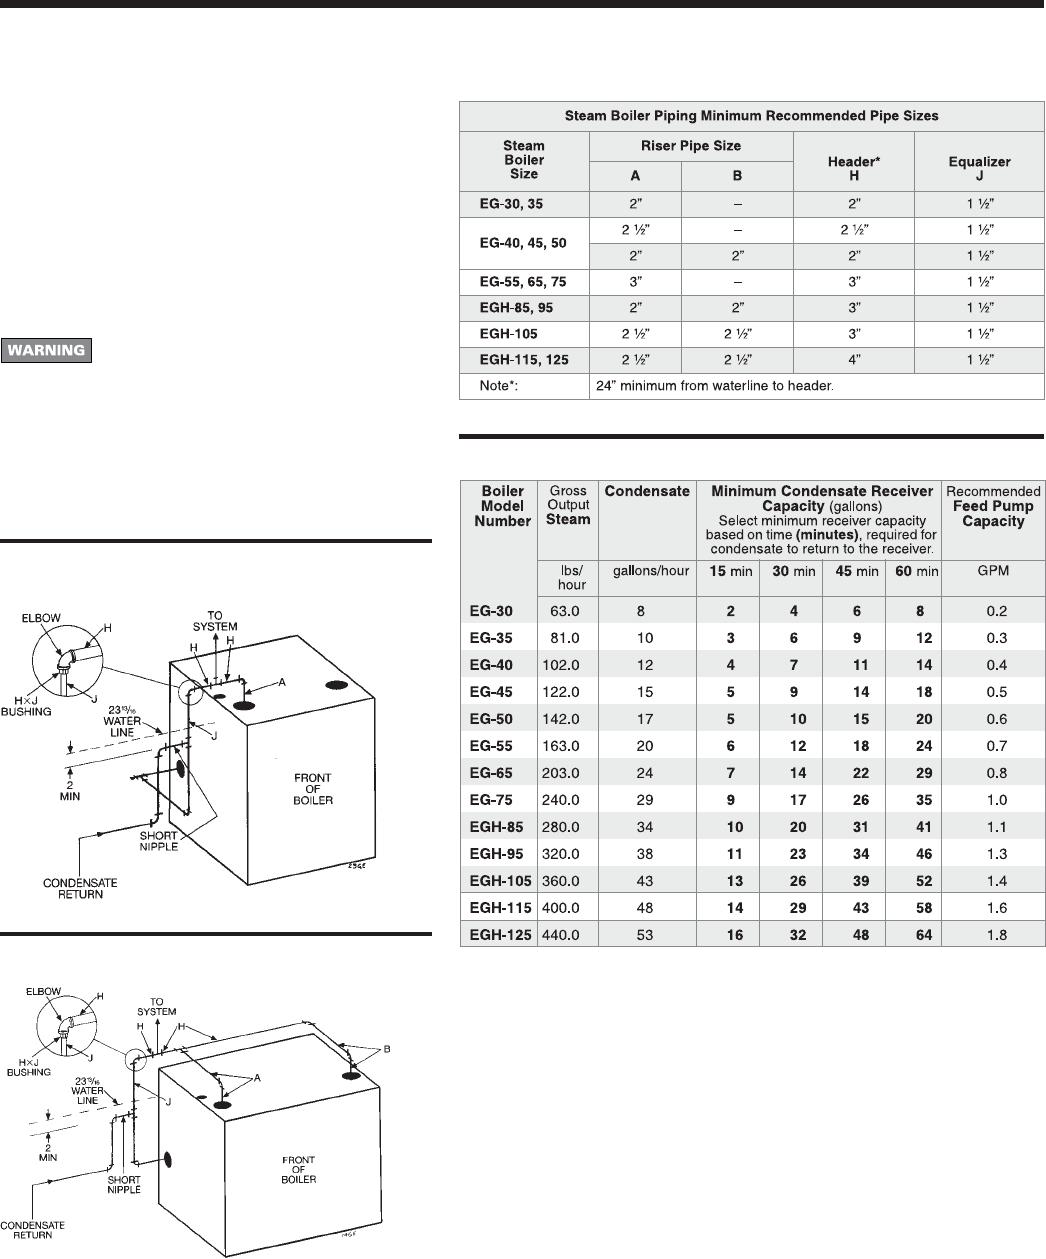 Weil Mclain Eg Users Manual 550 110 639 0703 on oil boiler diagram, weil mclain controls, boiler installation diagram, weil-mclain spark diagram, weil mclain transformer, weil-mclain boiler diagram,